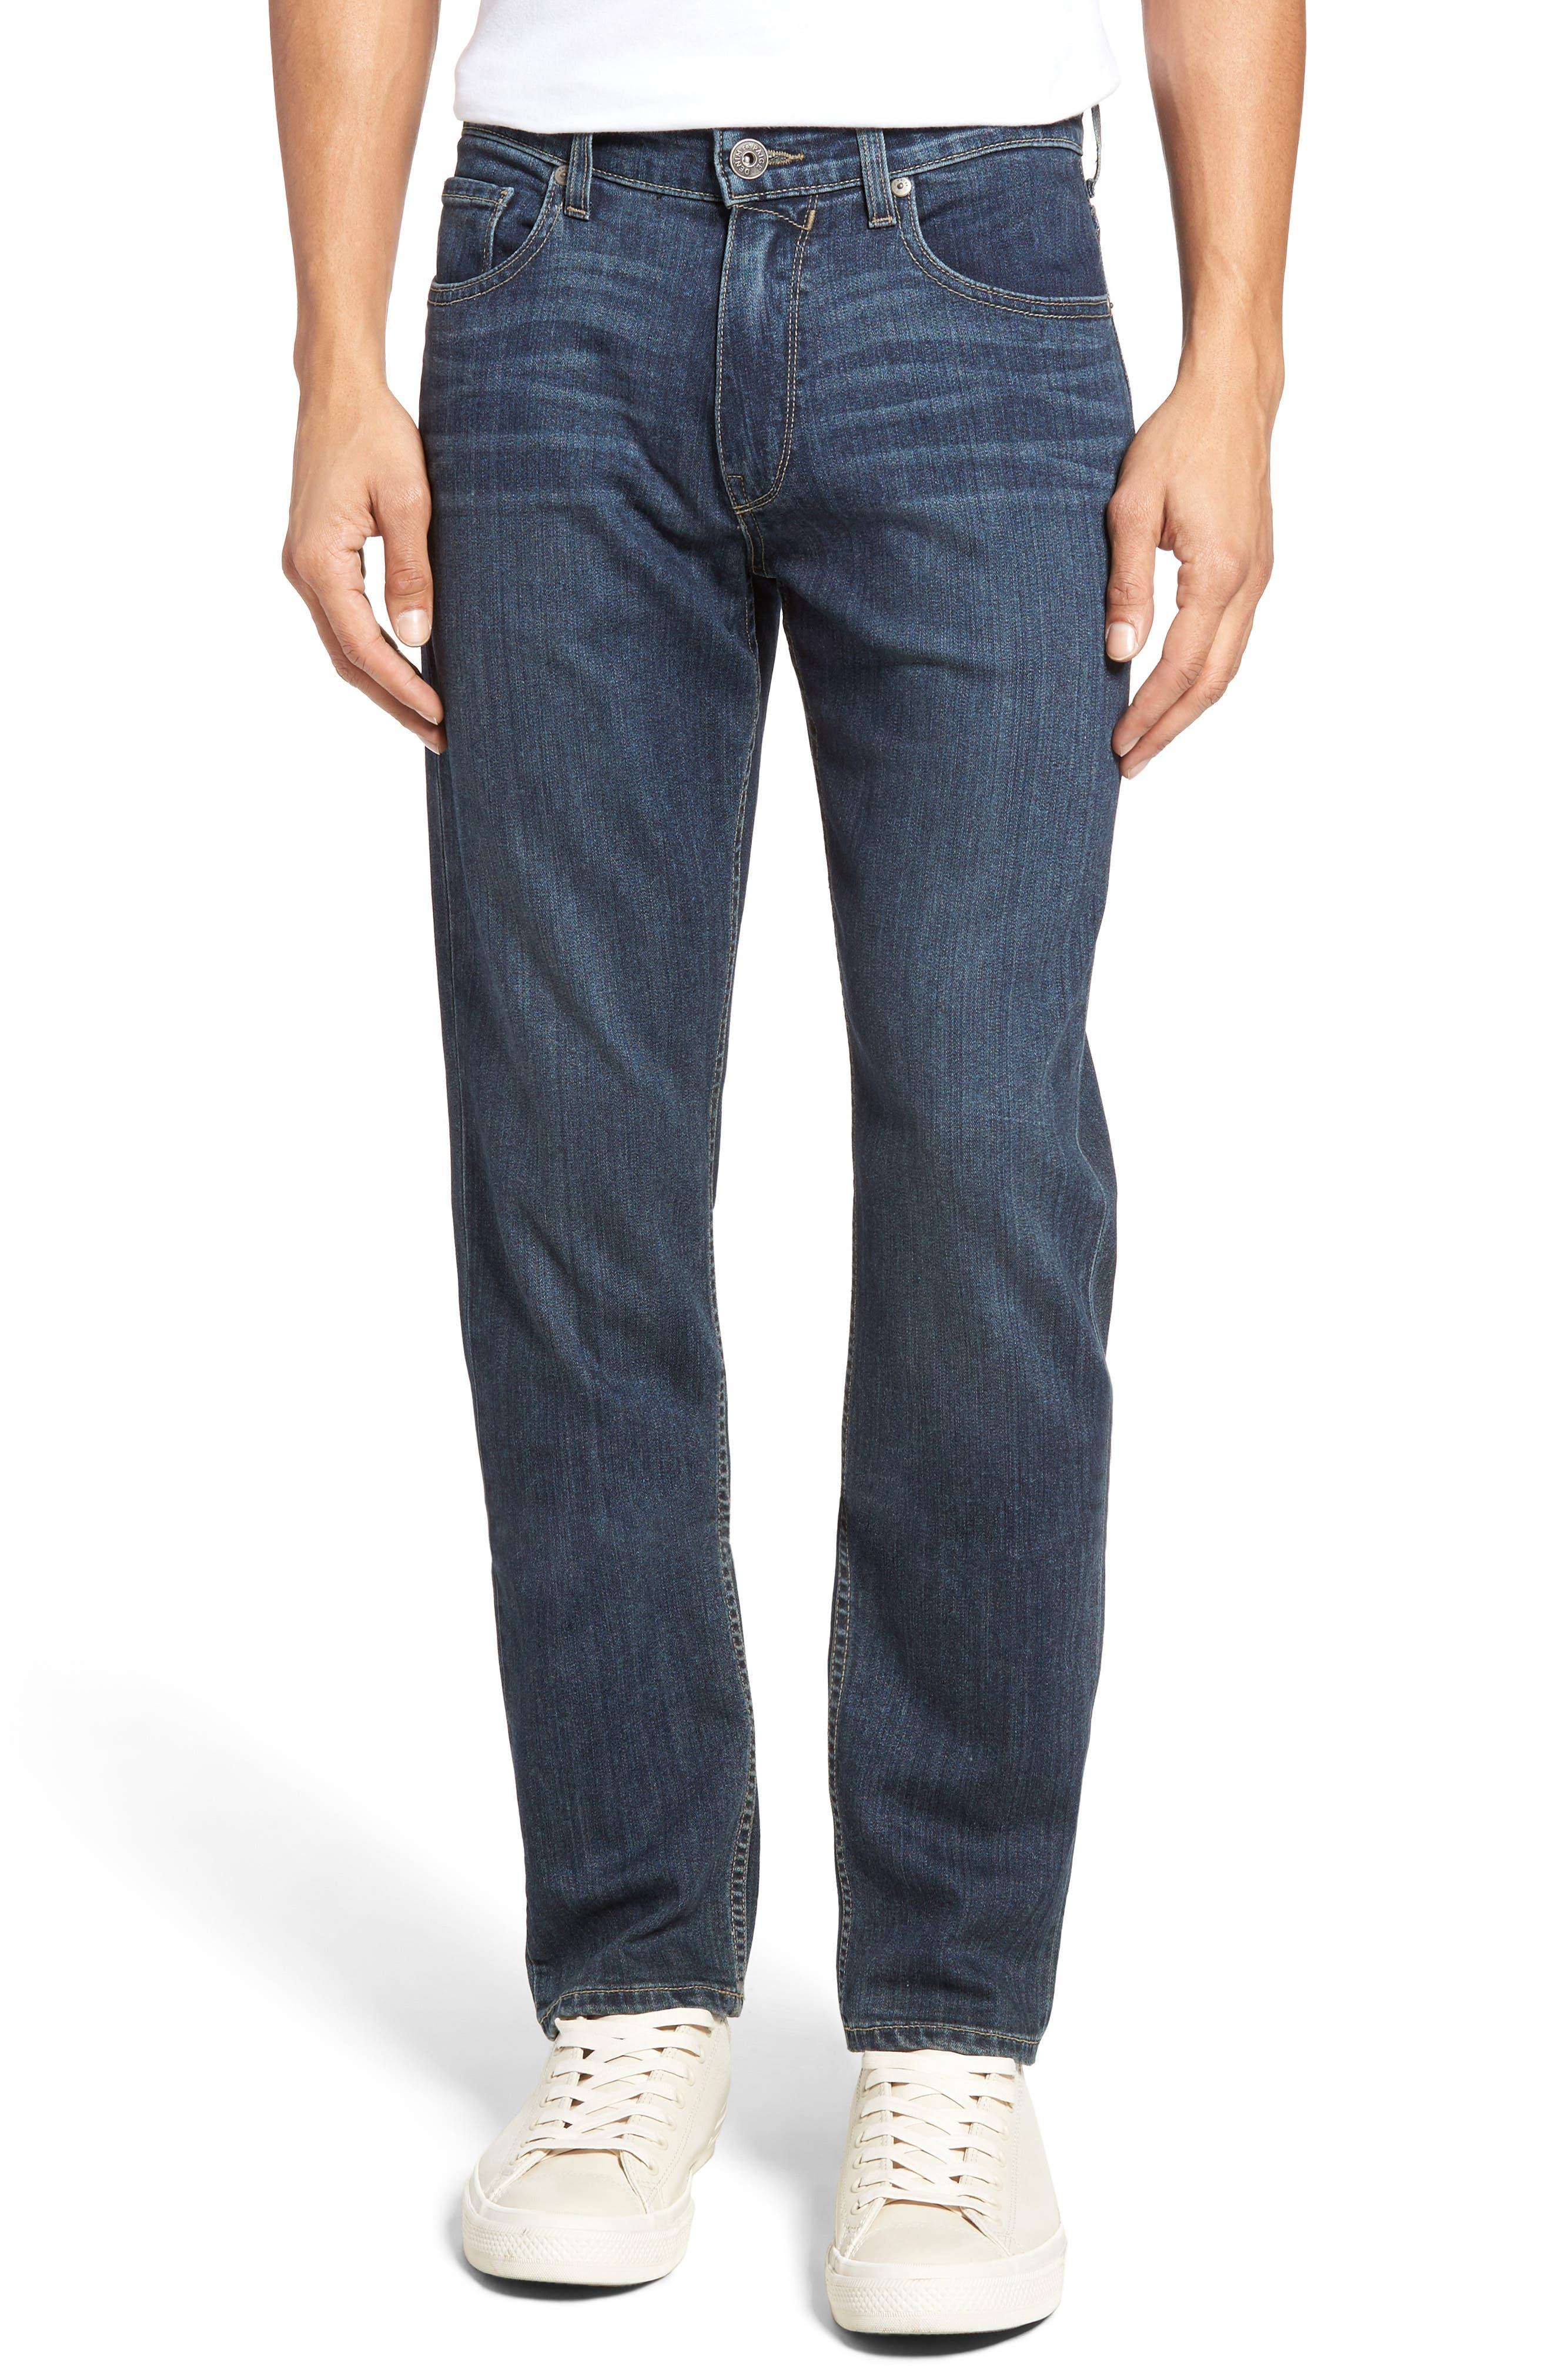 Transcend - Federal Slim Straight Leg Jeans,                             Main thumbnail 1, color,                             Wayne